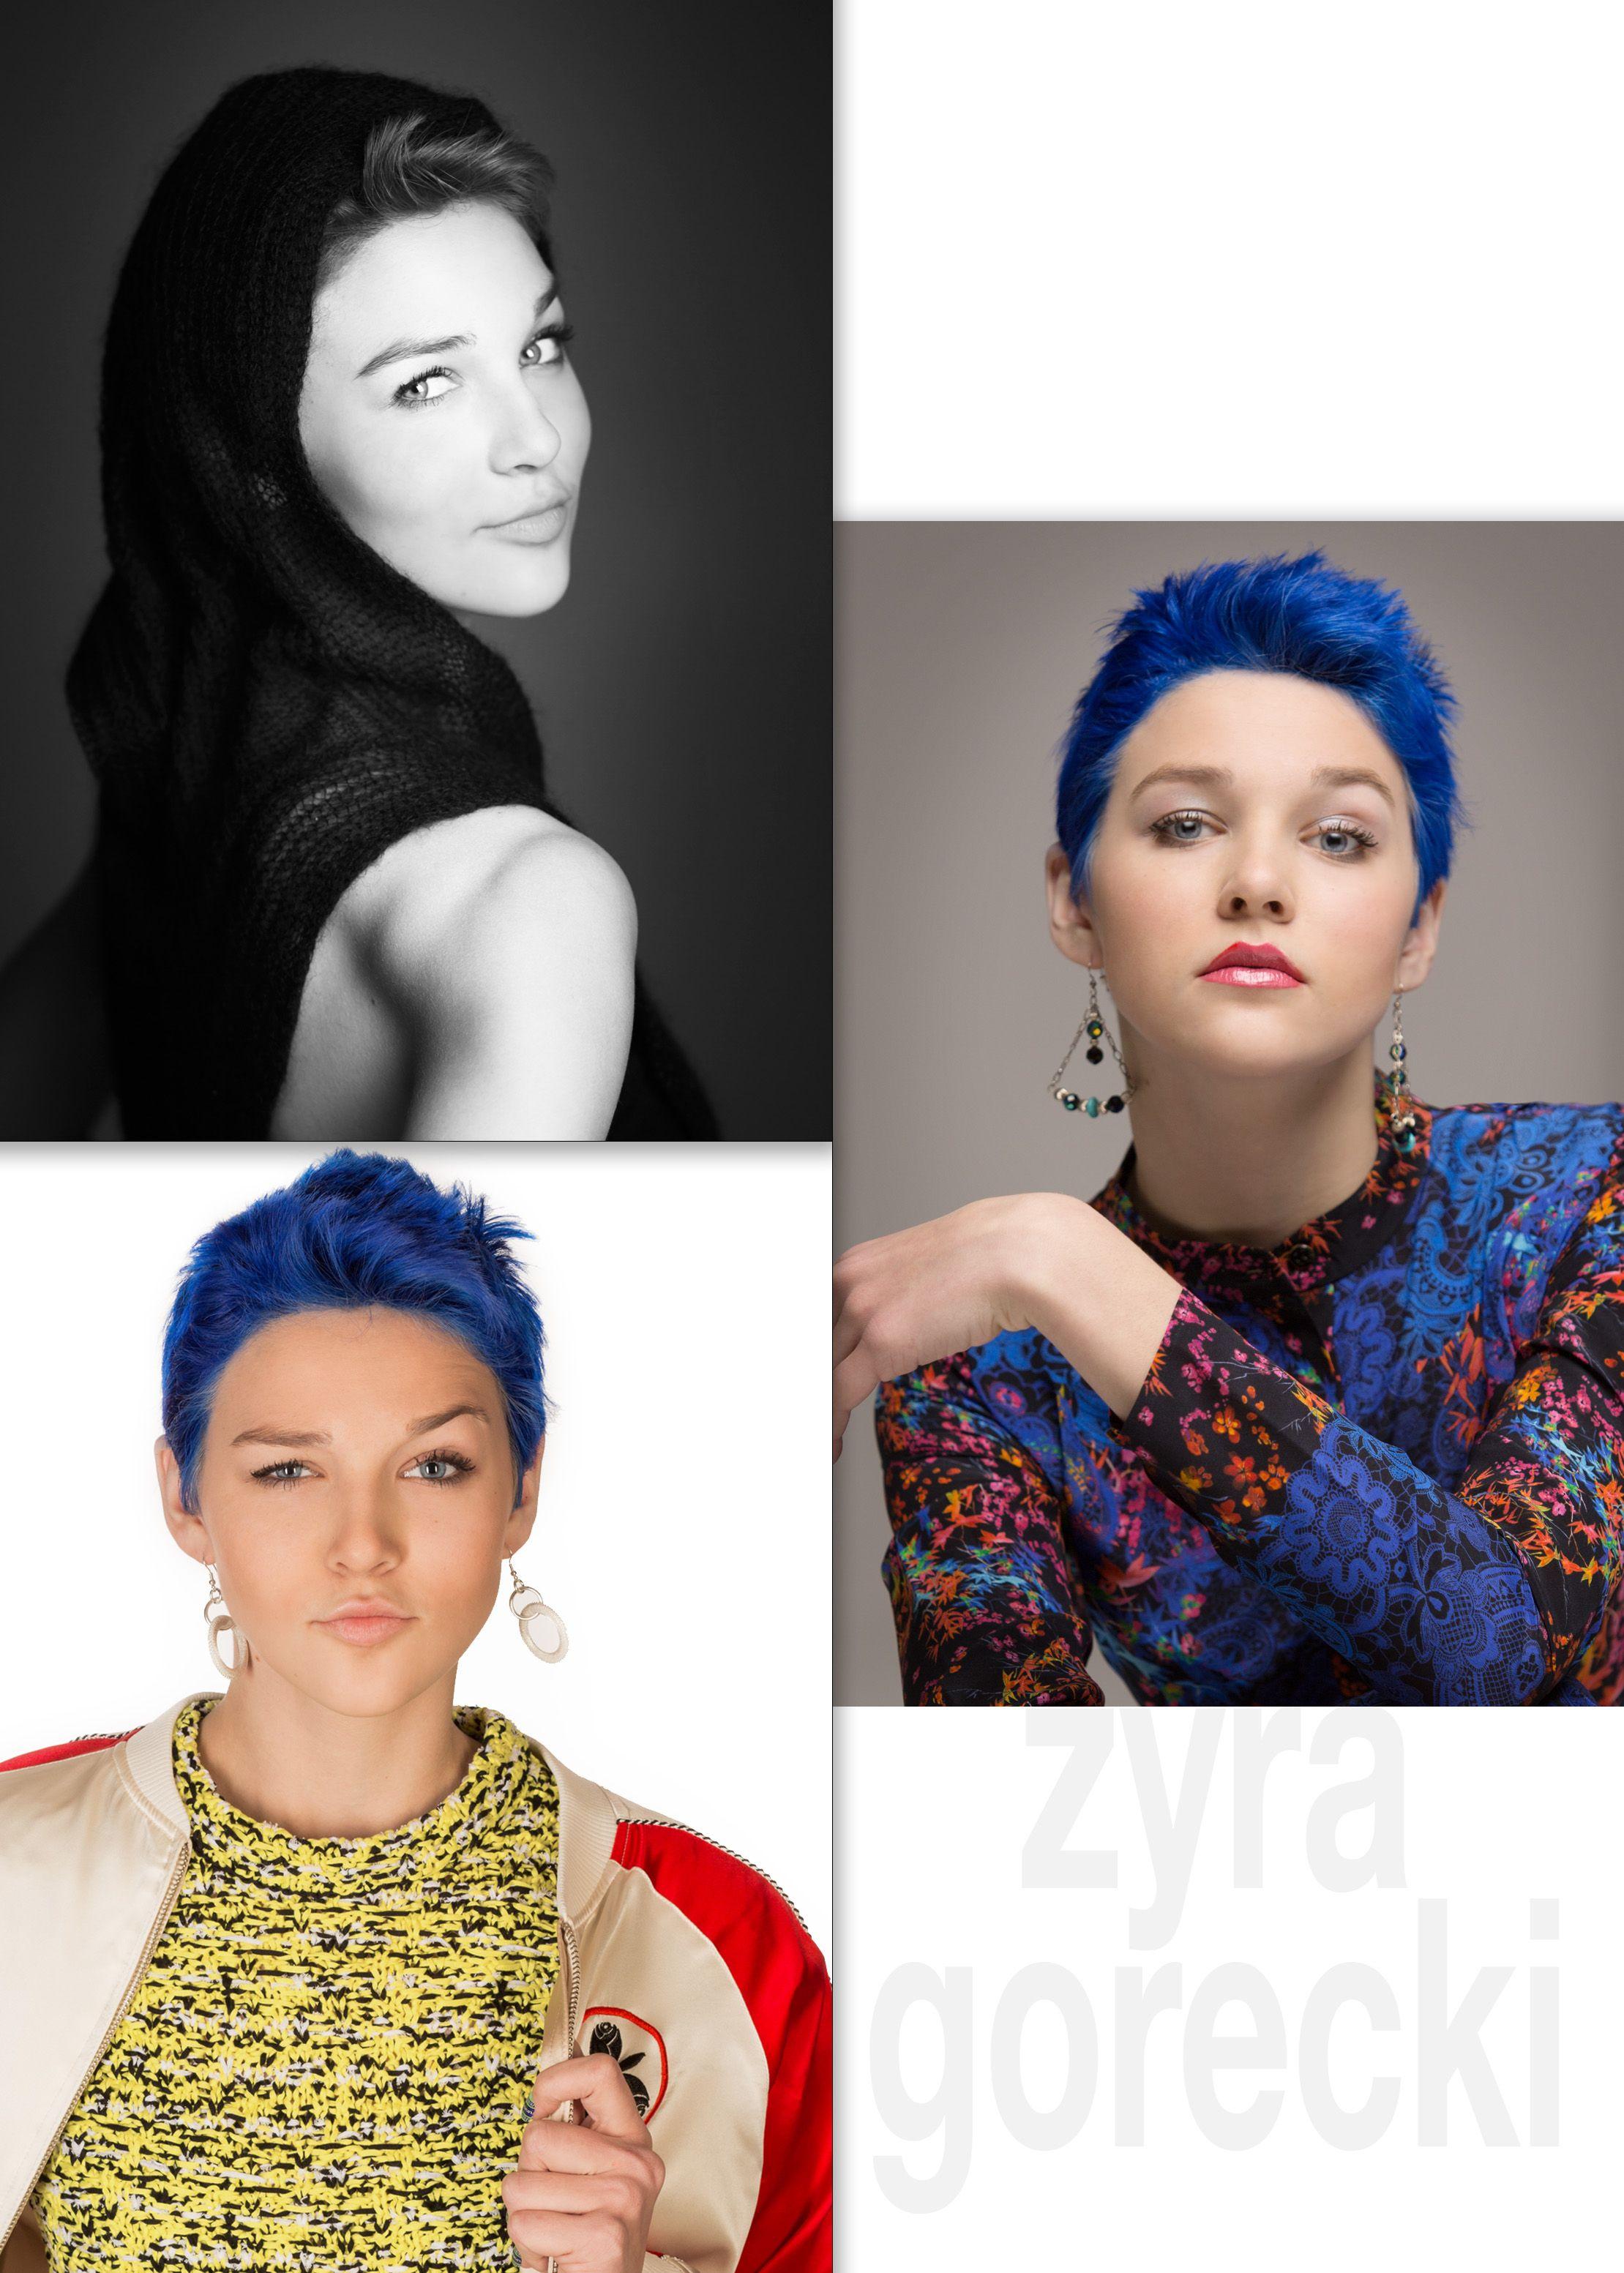 Learn who is Strong, Determined & Unique... meet Zyra Bravo's Model of the Week #papadakisphotography#georgepapadakis#bravotalentmanagement#model#unique#determined#spiritual#karate#harrypotter#blue#inspirational#good energy